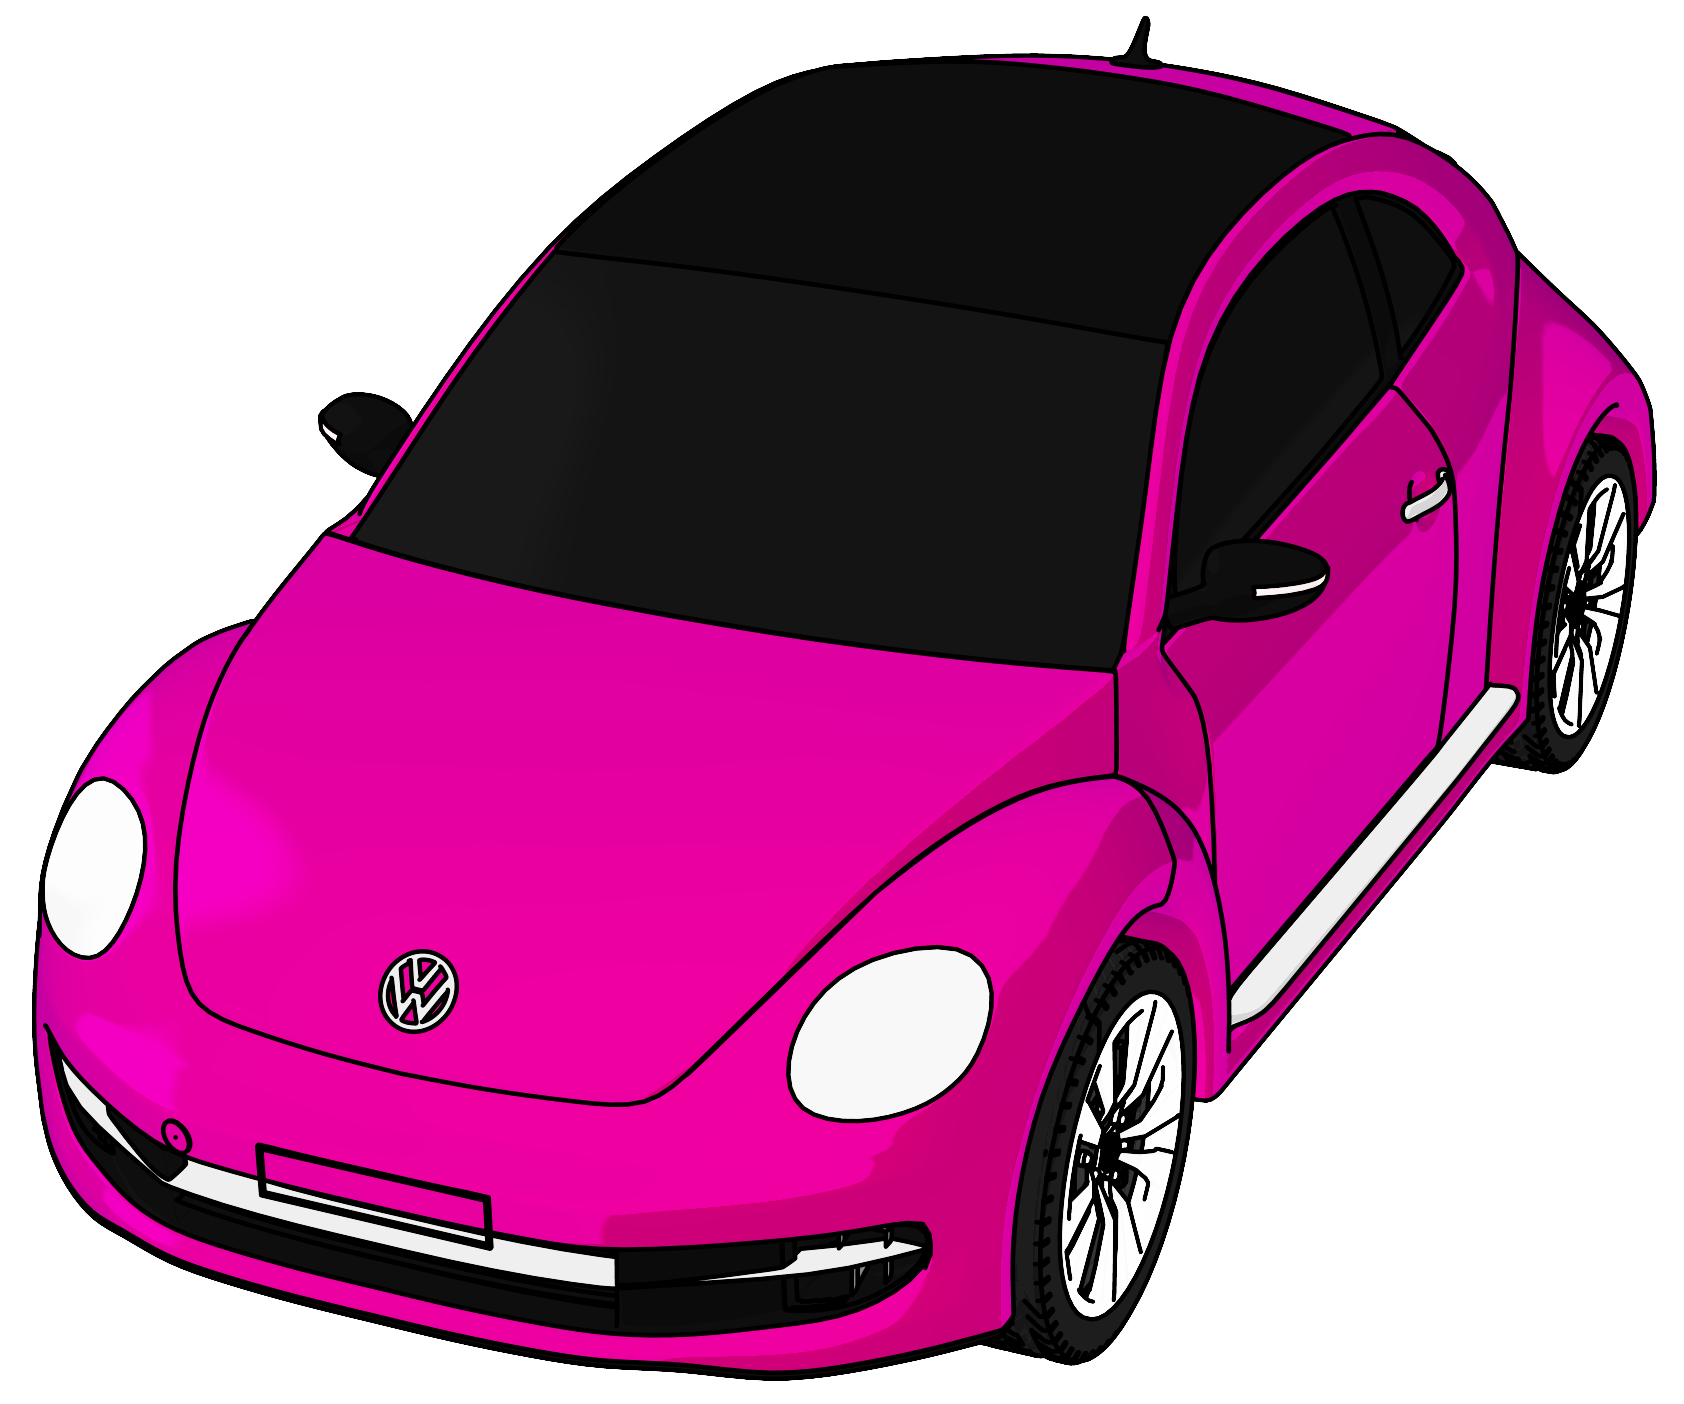 Vw volkswagen perspective view. Clipart cars beetle